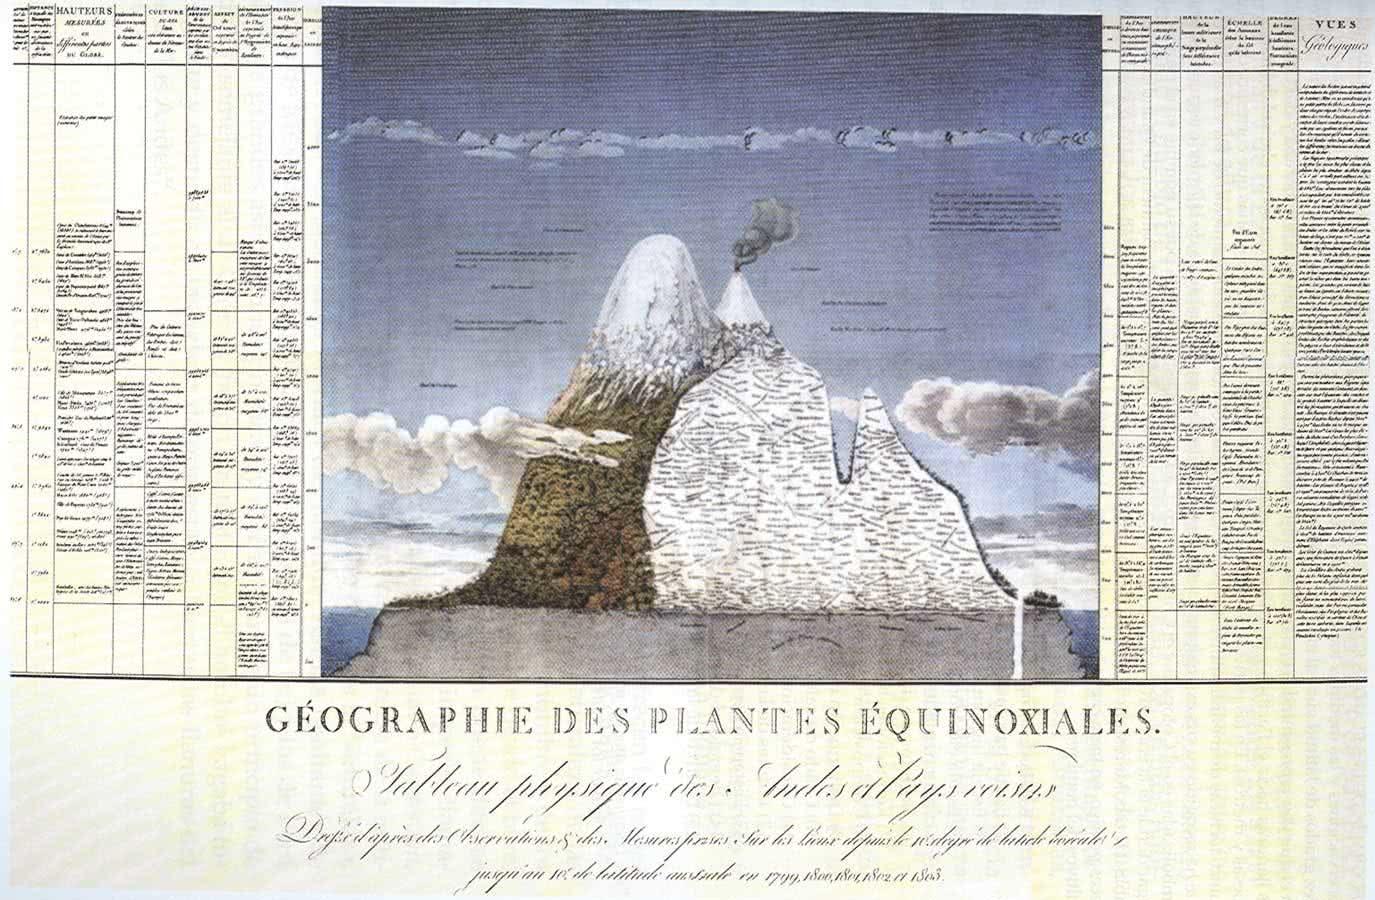 Alexander von Humboldt Geographie des plantes equinoxiales